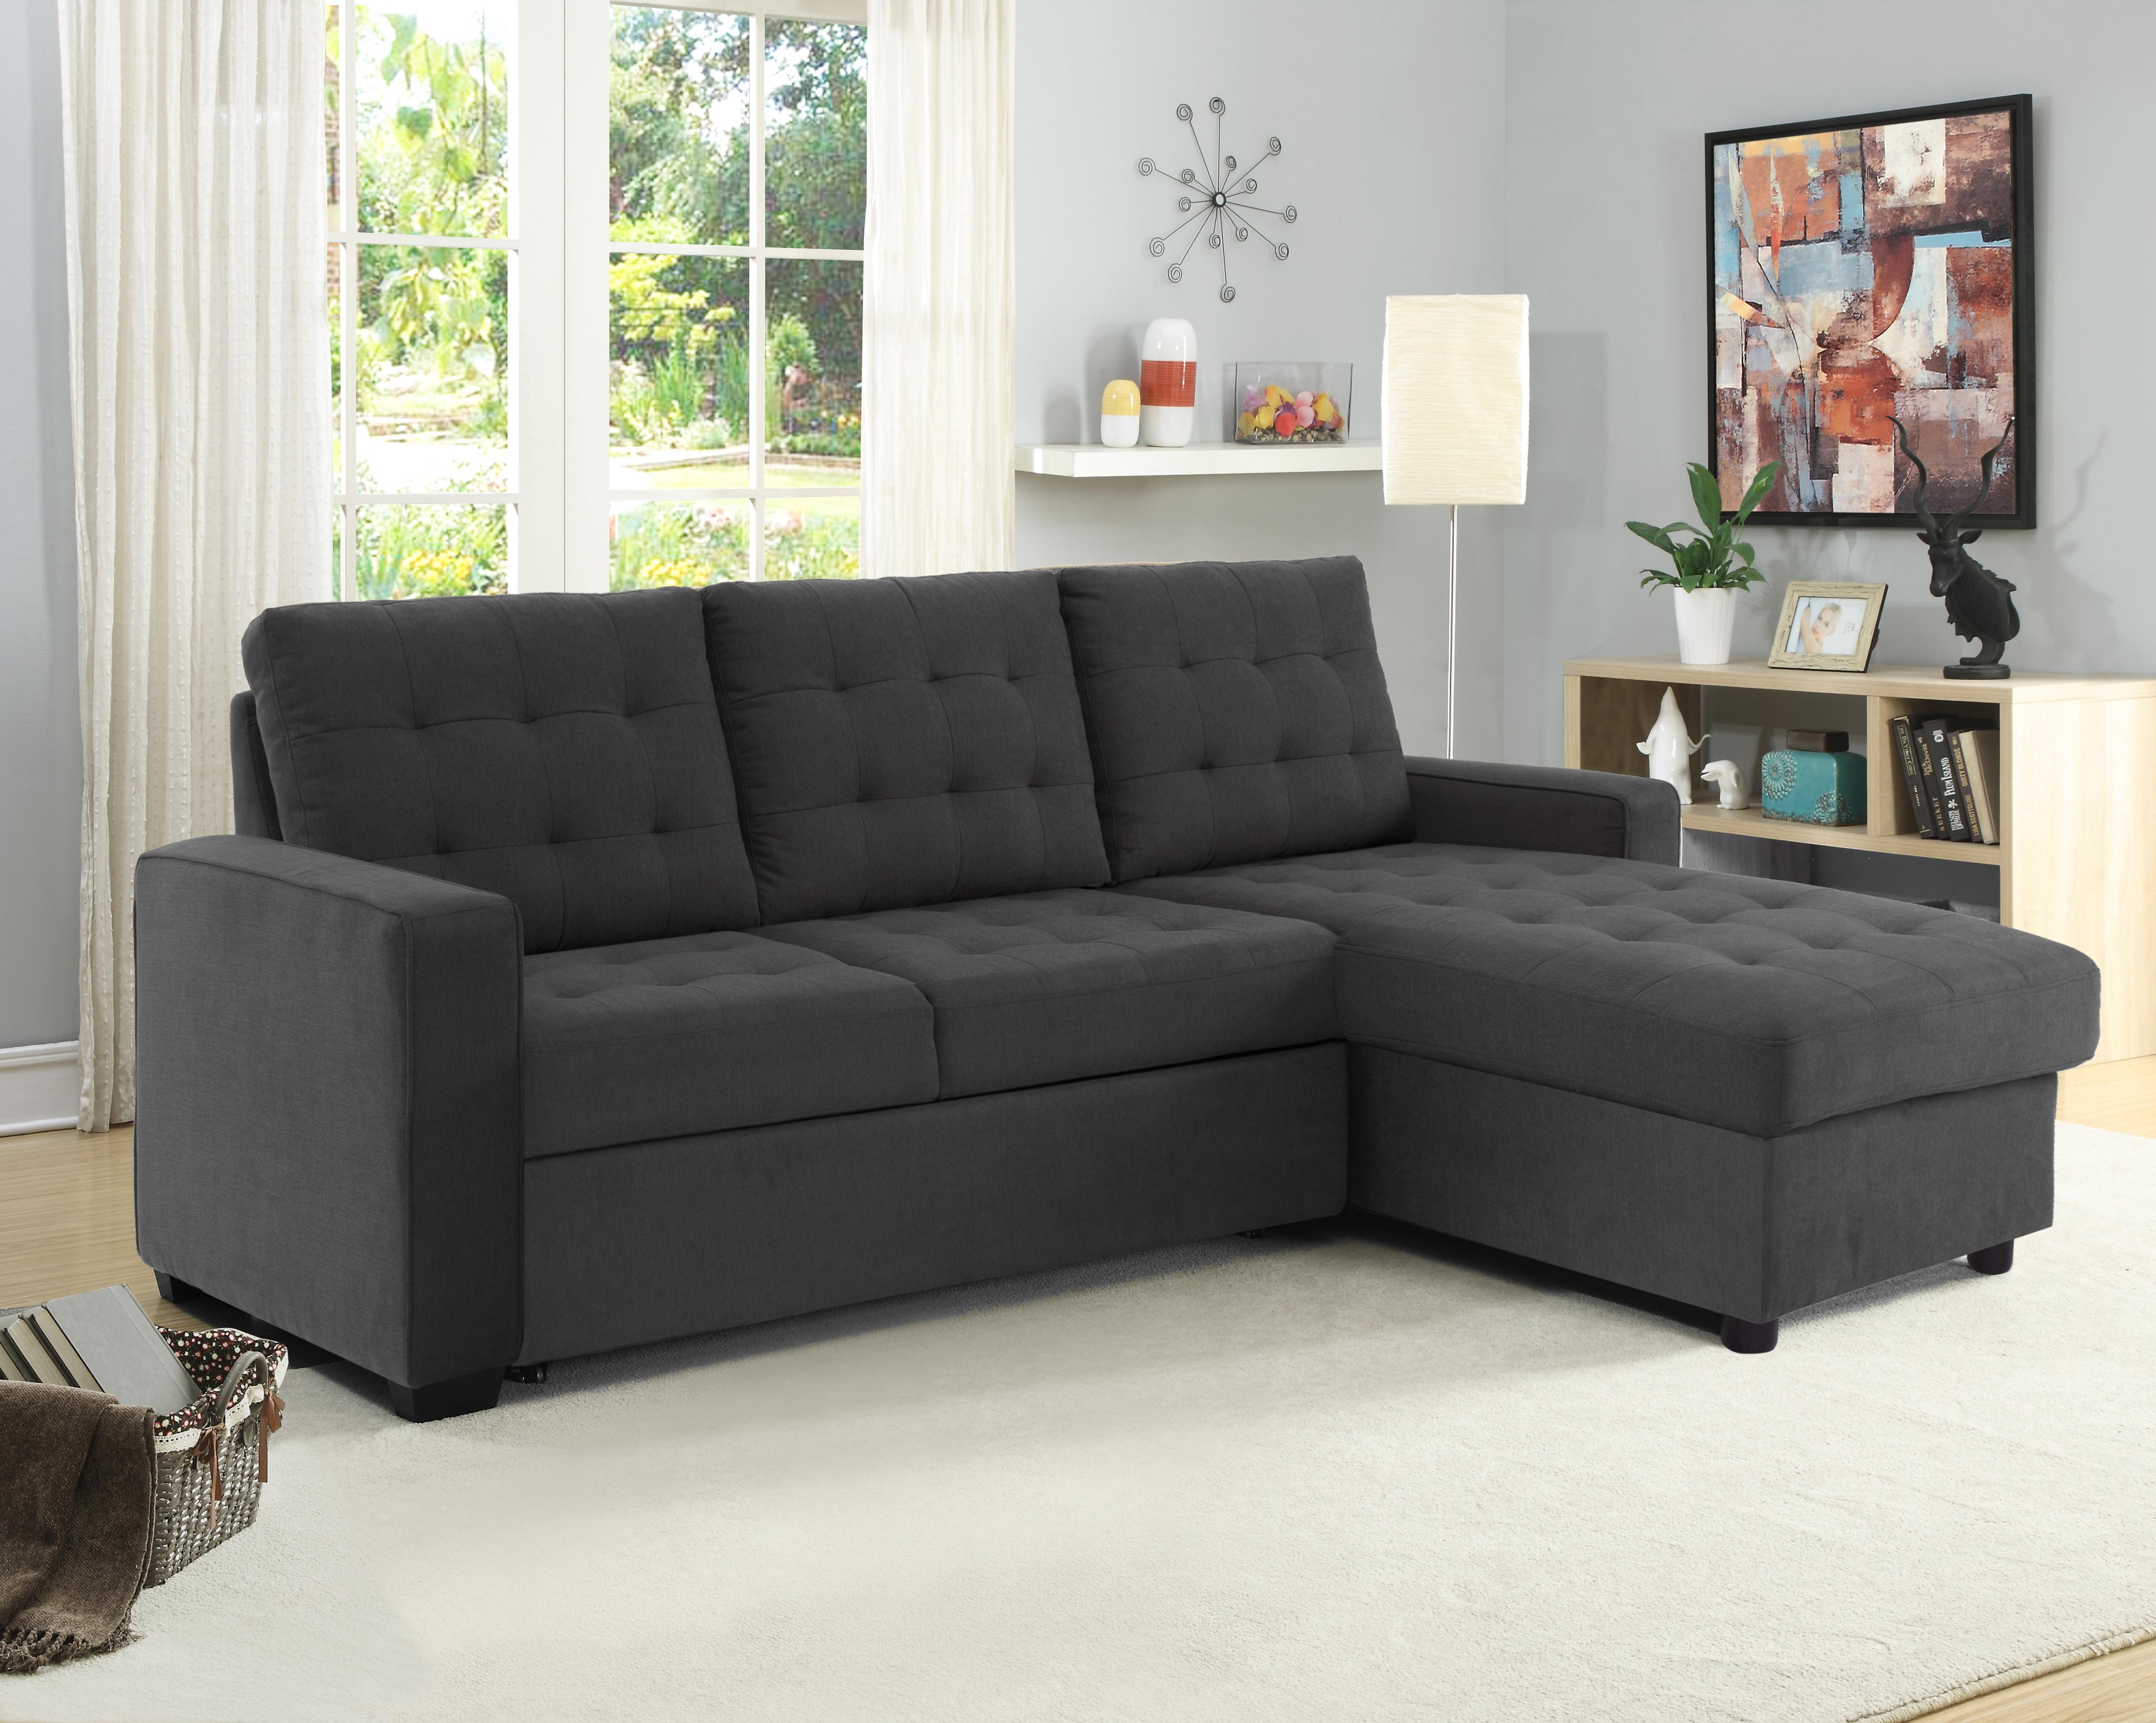 Serta Bostal Sectional Sofa Convertible: converts into a sofa